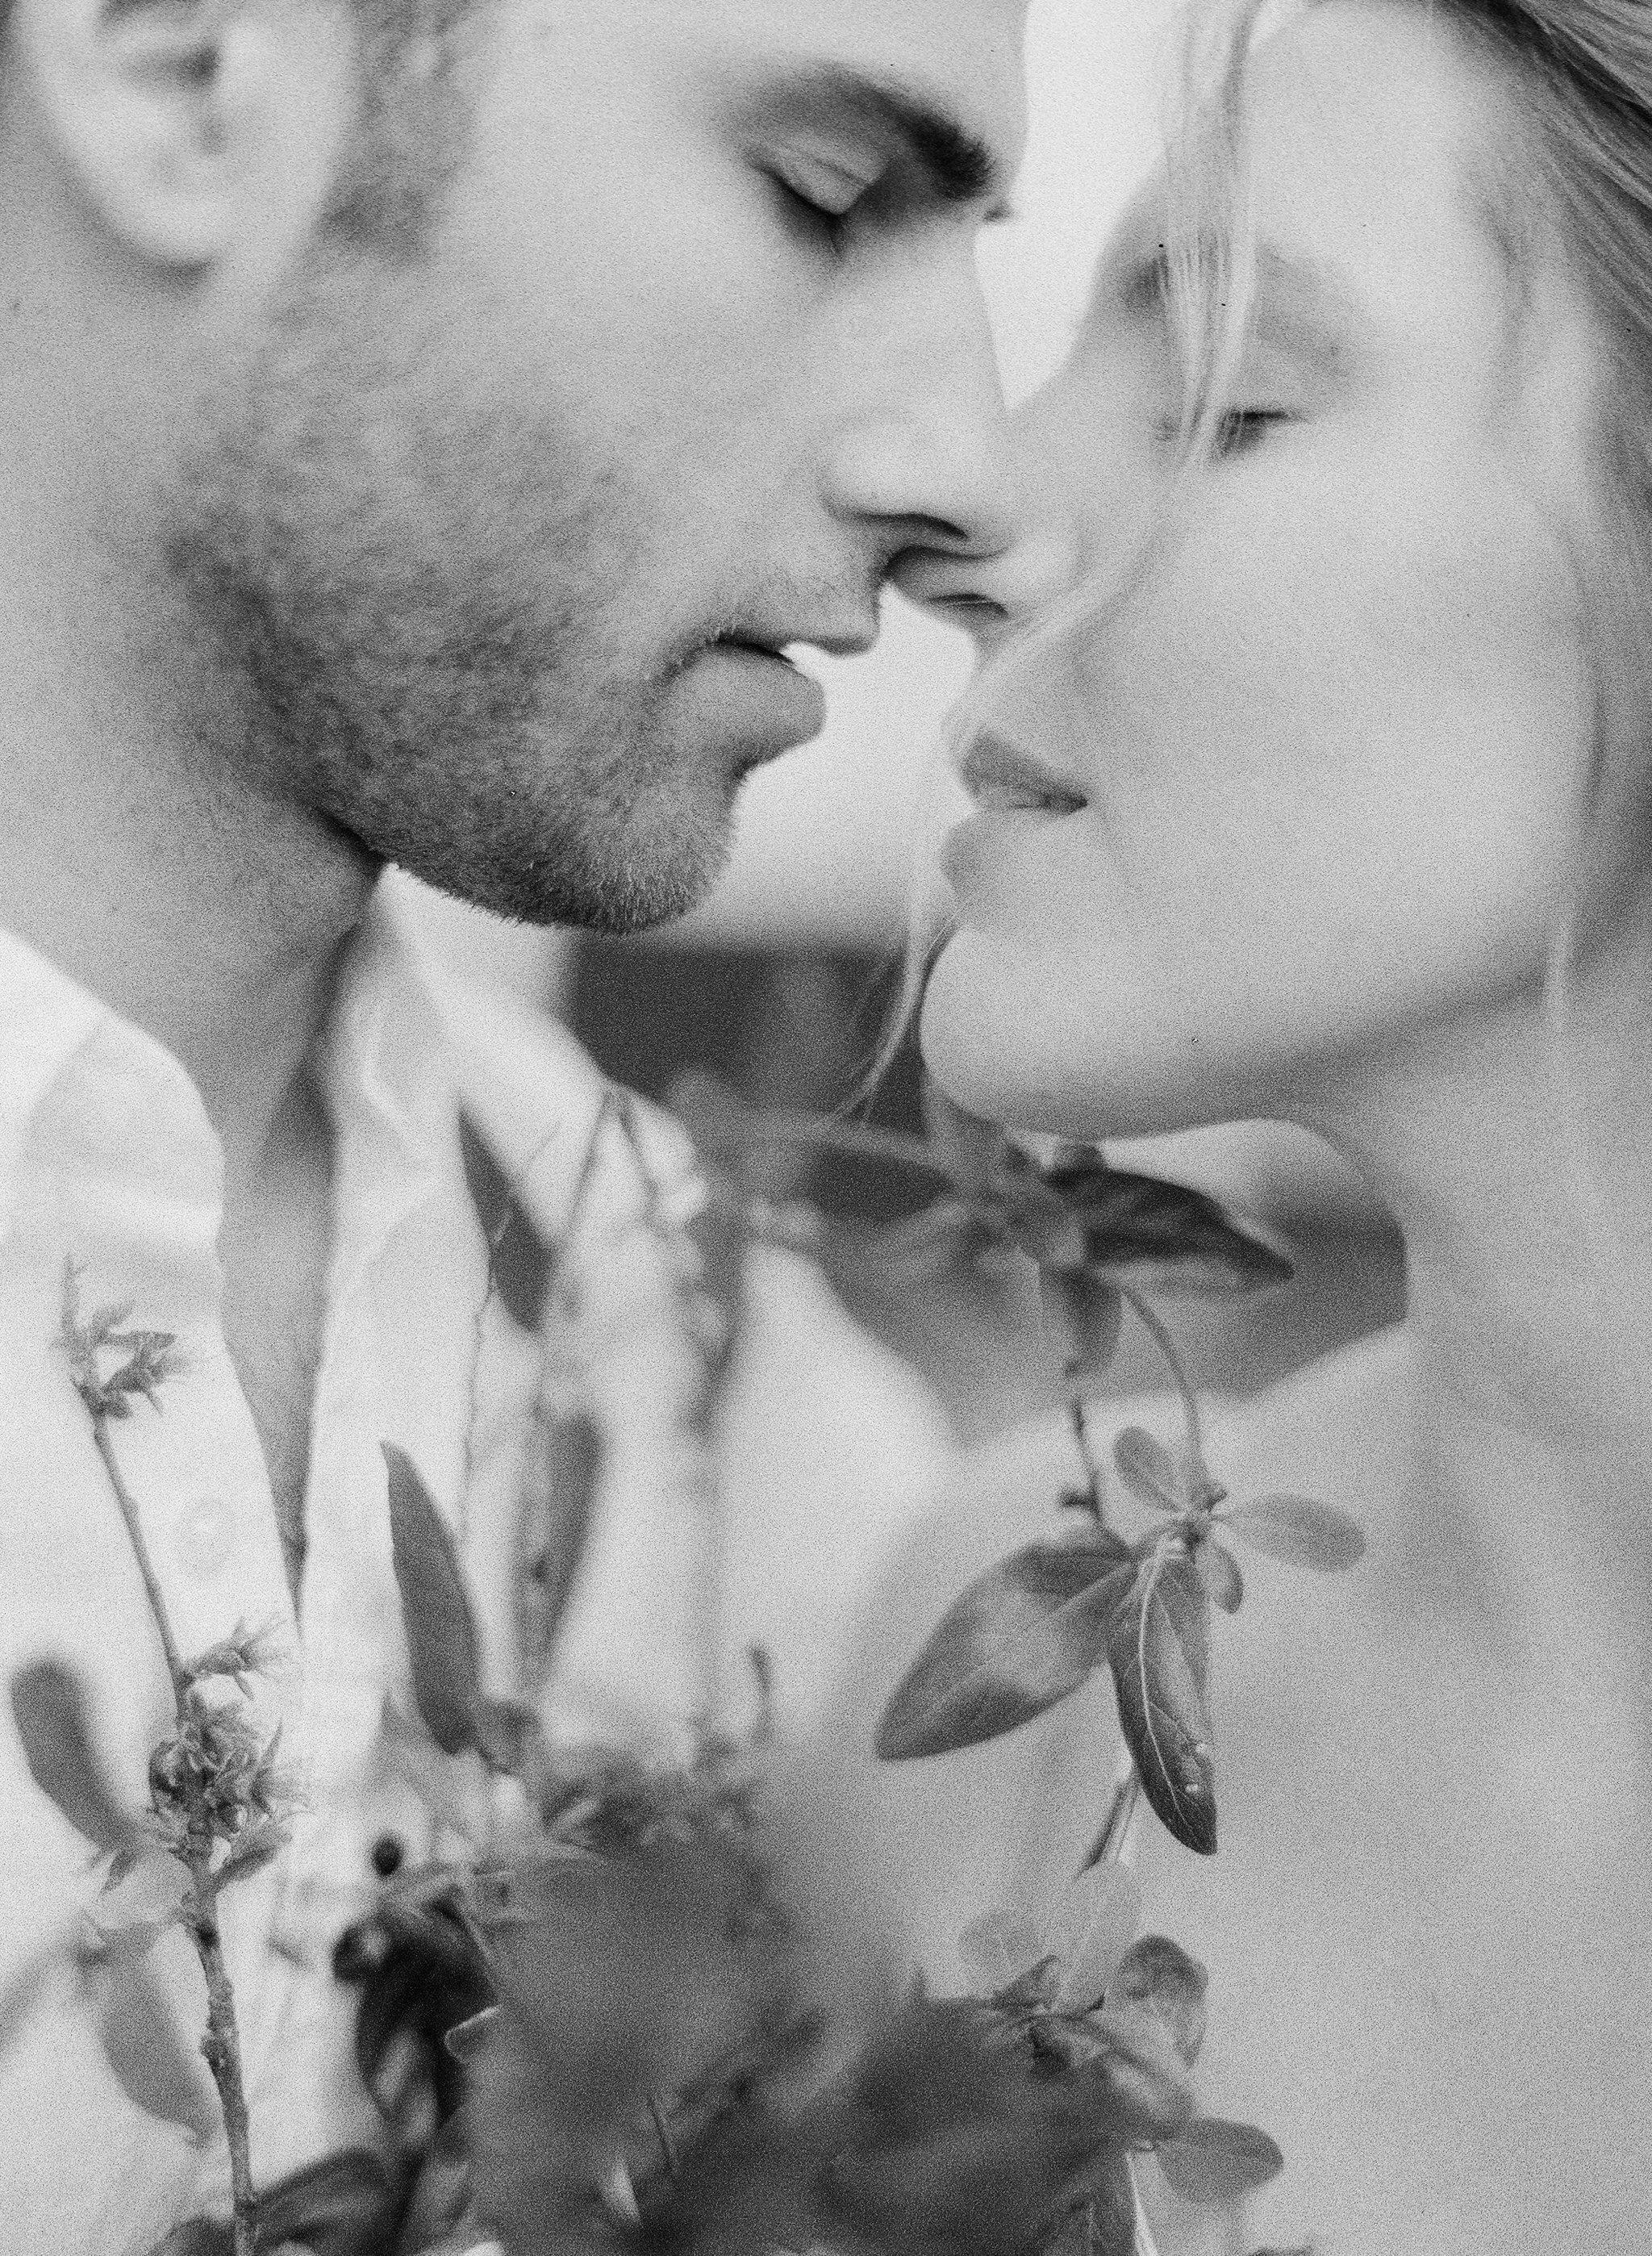 Euphorbia lavender wedding gown-0247.jpg